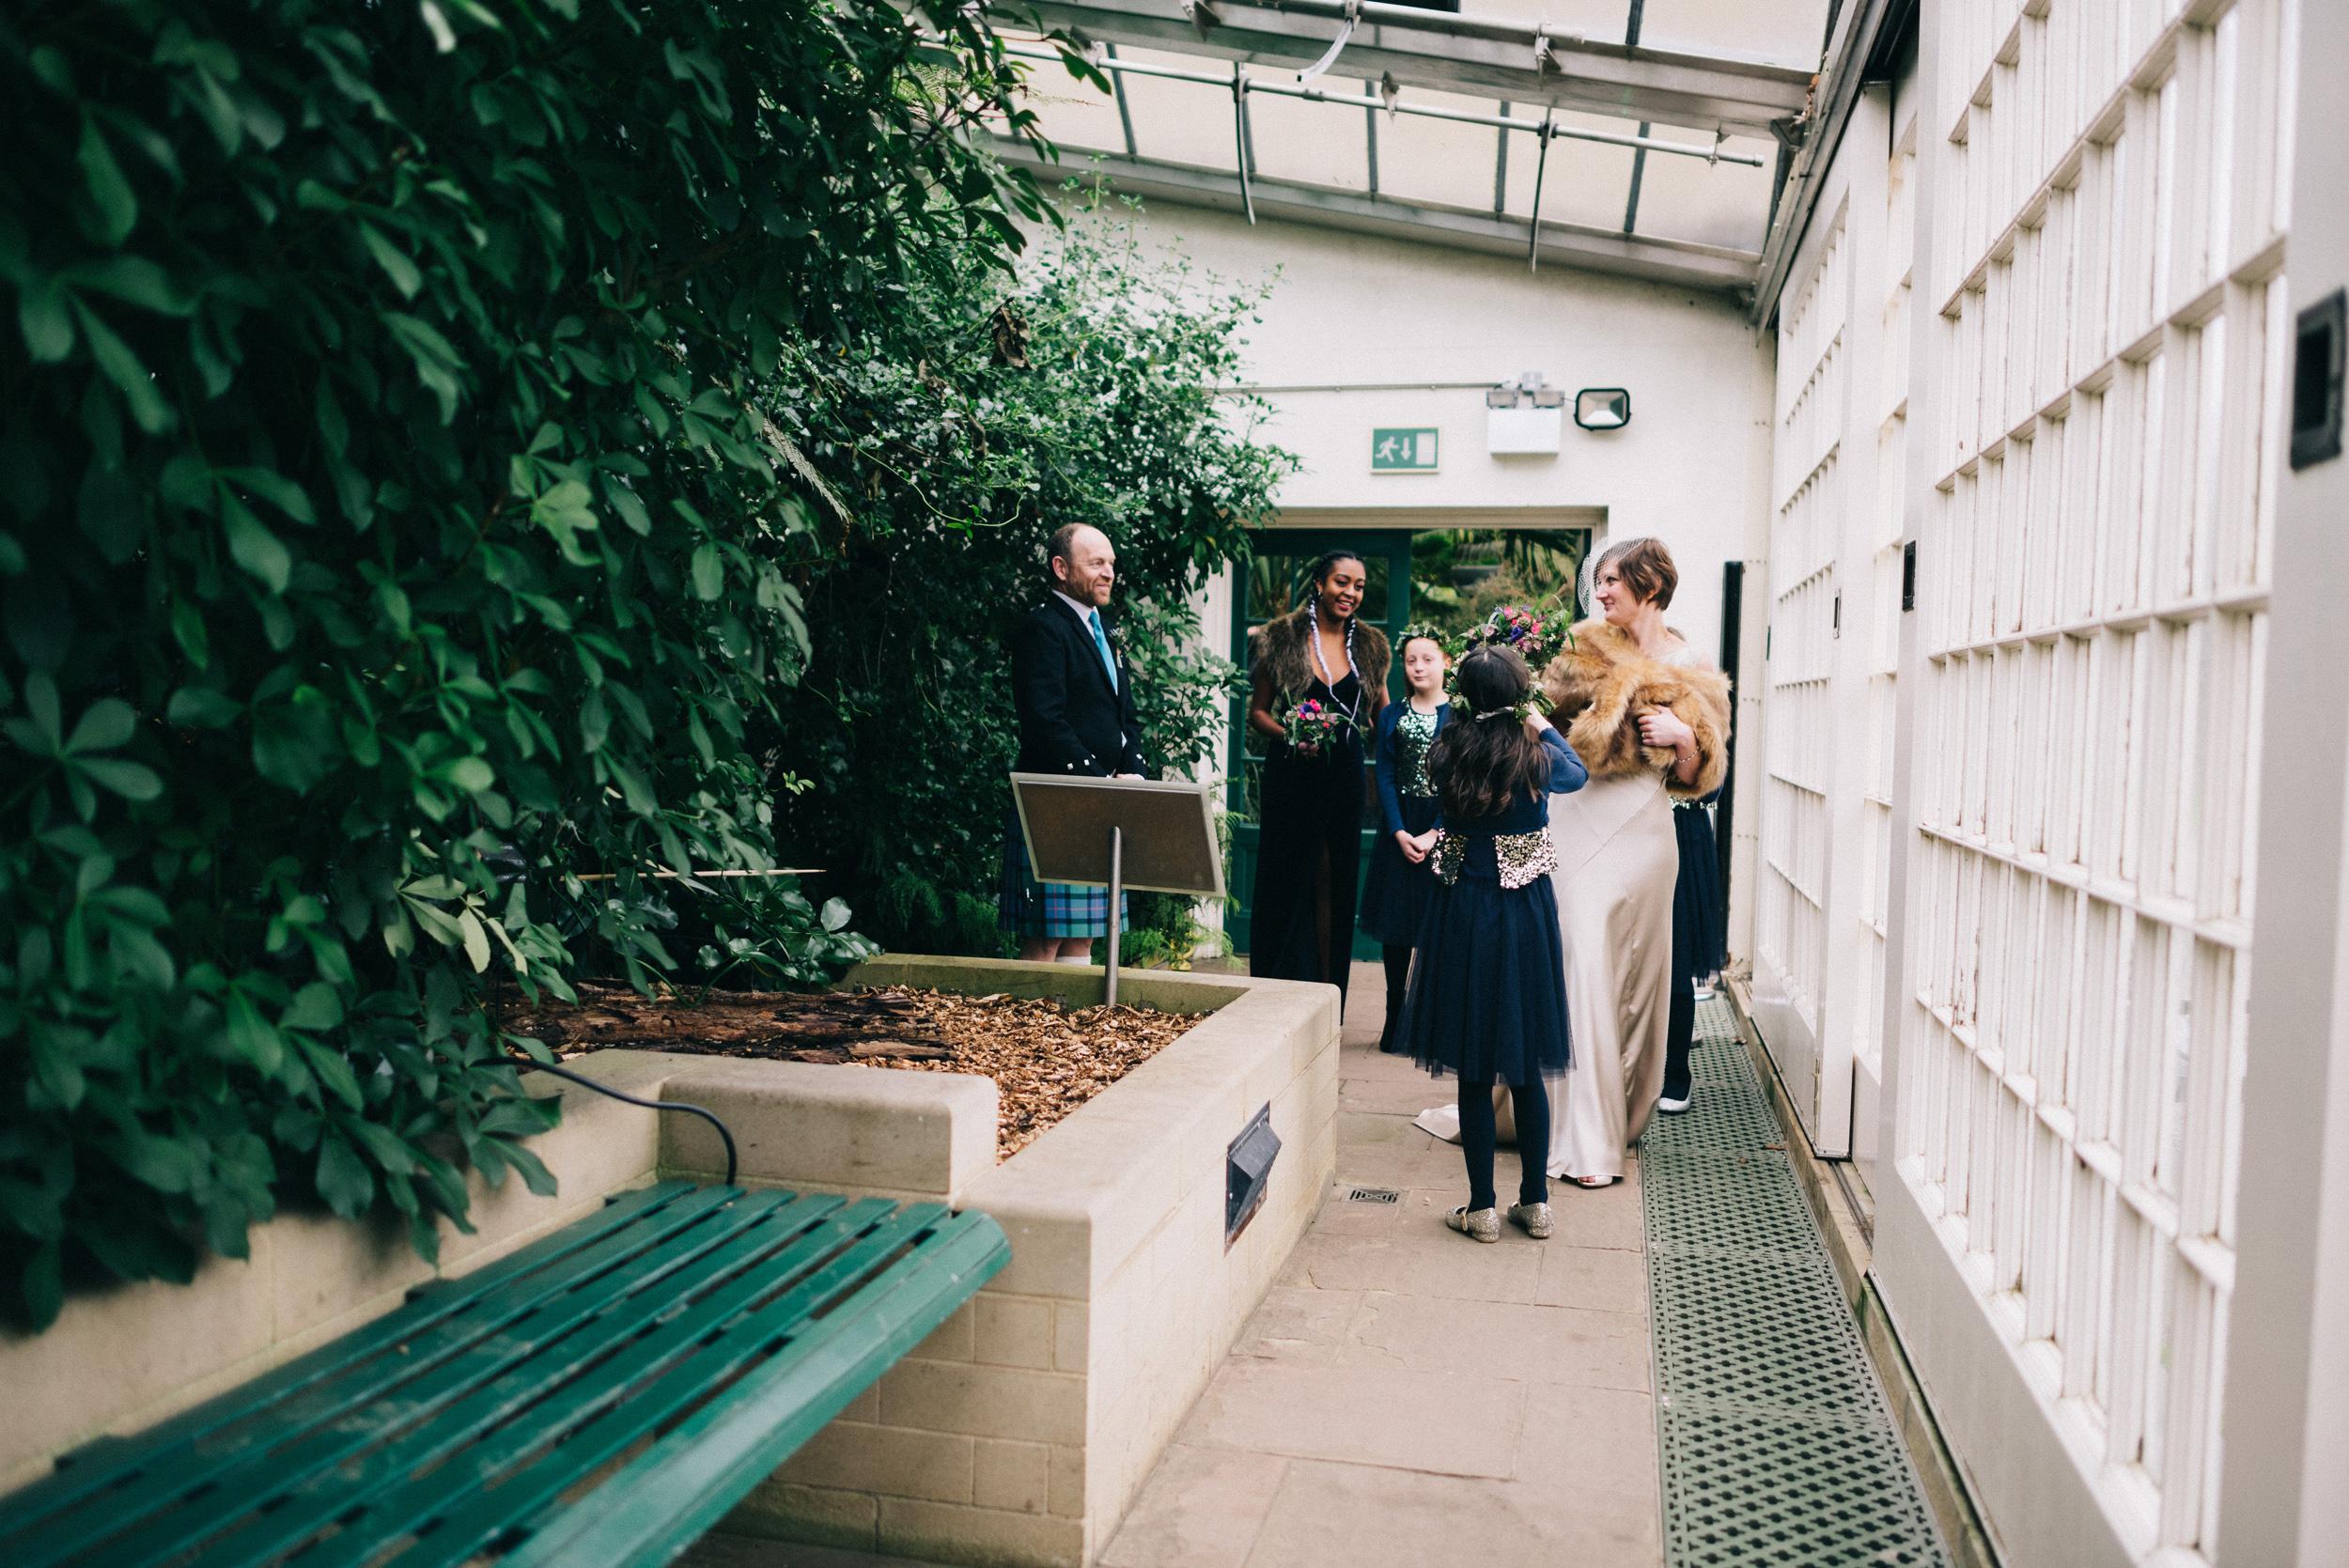 Alice-Bias-Cut-Silk-Wedding-Dress-Kate-Beaumont-Sheffield-Botanical-Gardens-by-Peakography-14.jpg